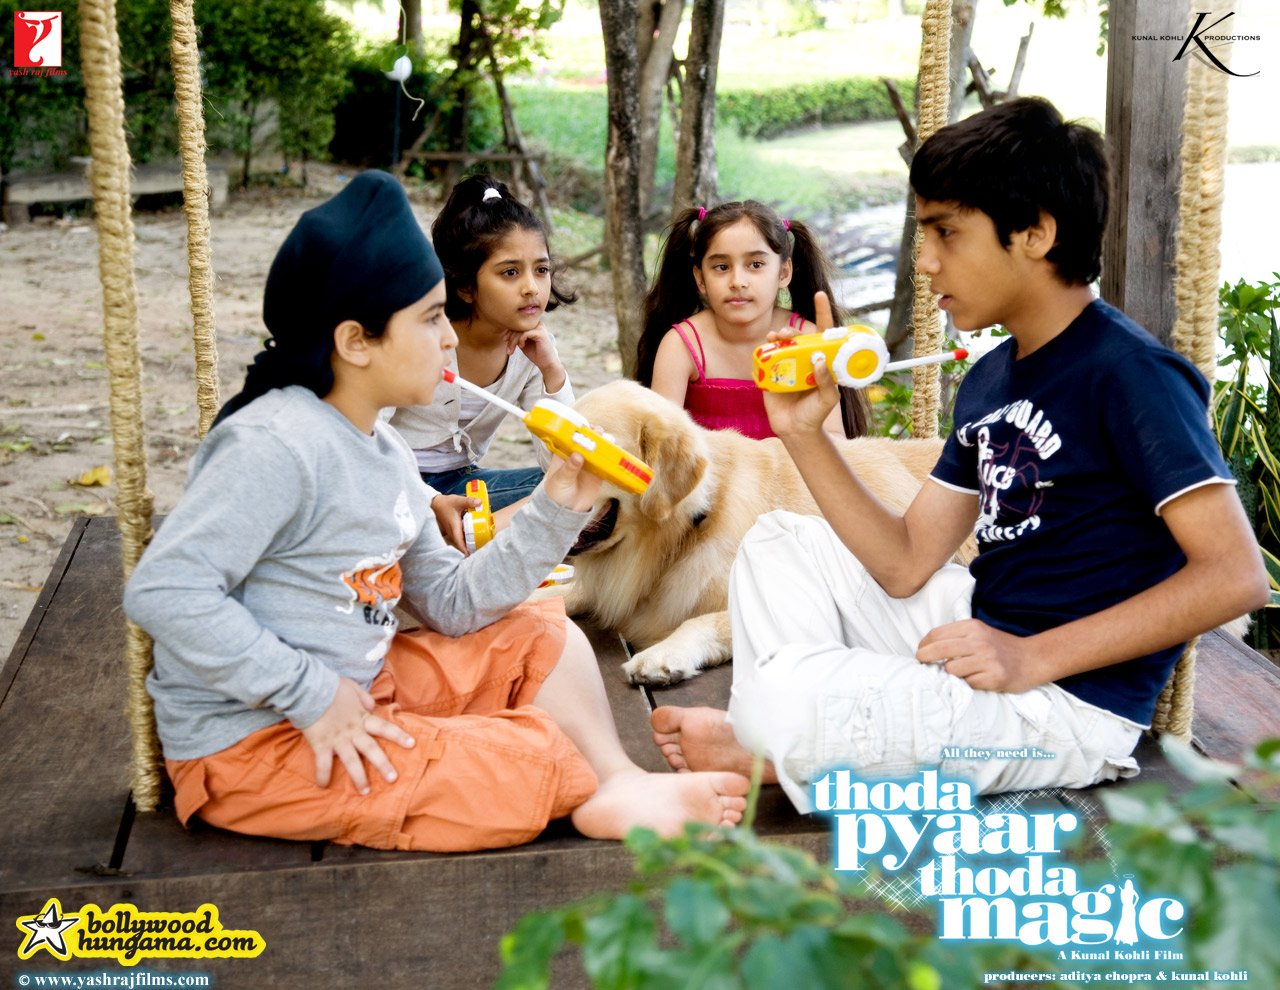 http://i.indiafm.com/posters/movies/08/thodapyaarthodamagic/still13.jpg